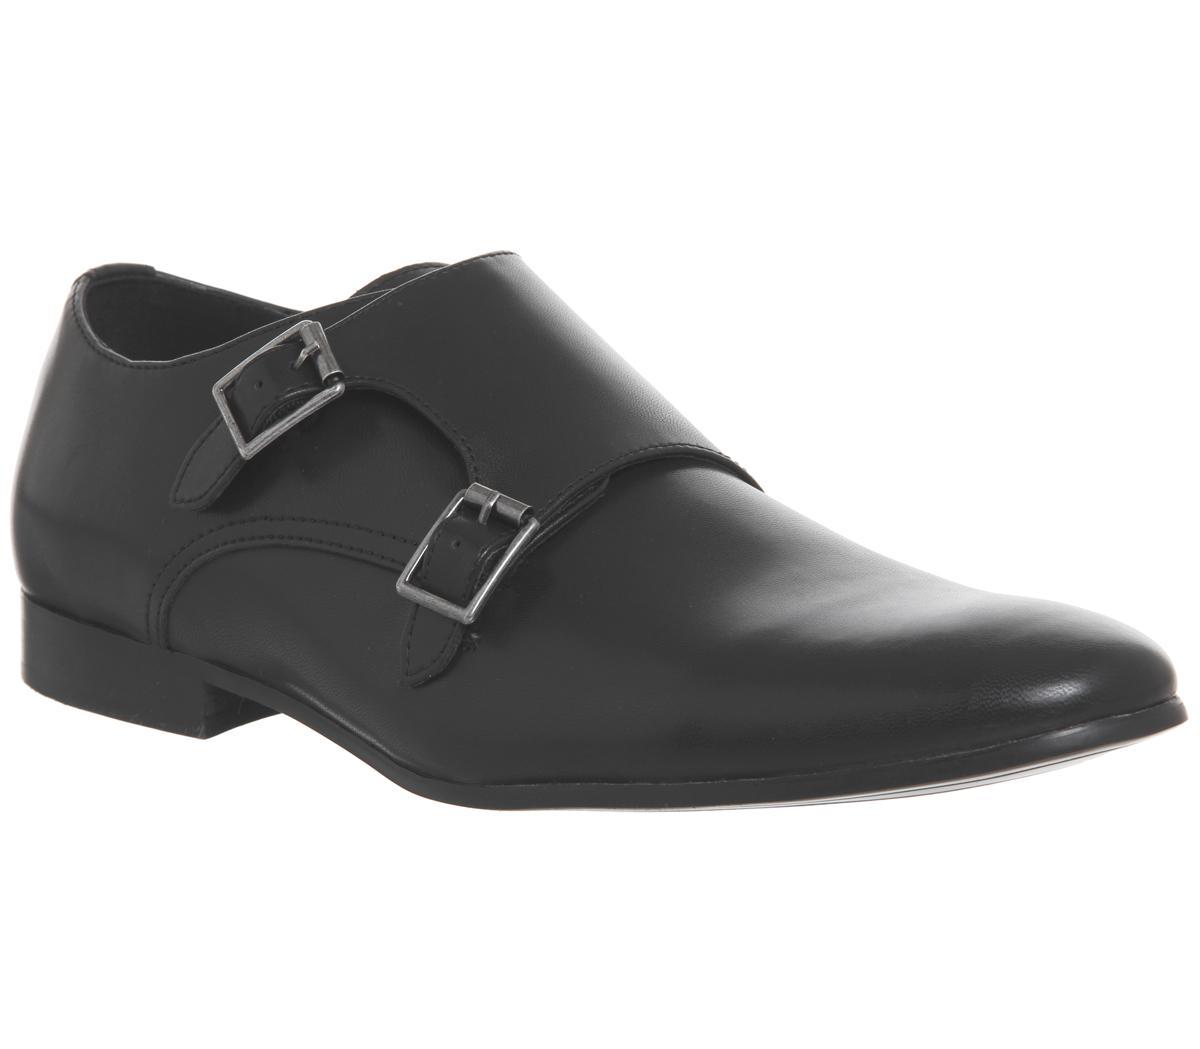 Office Fox Monk Shoes Black Smart